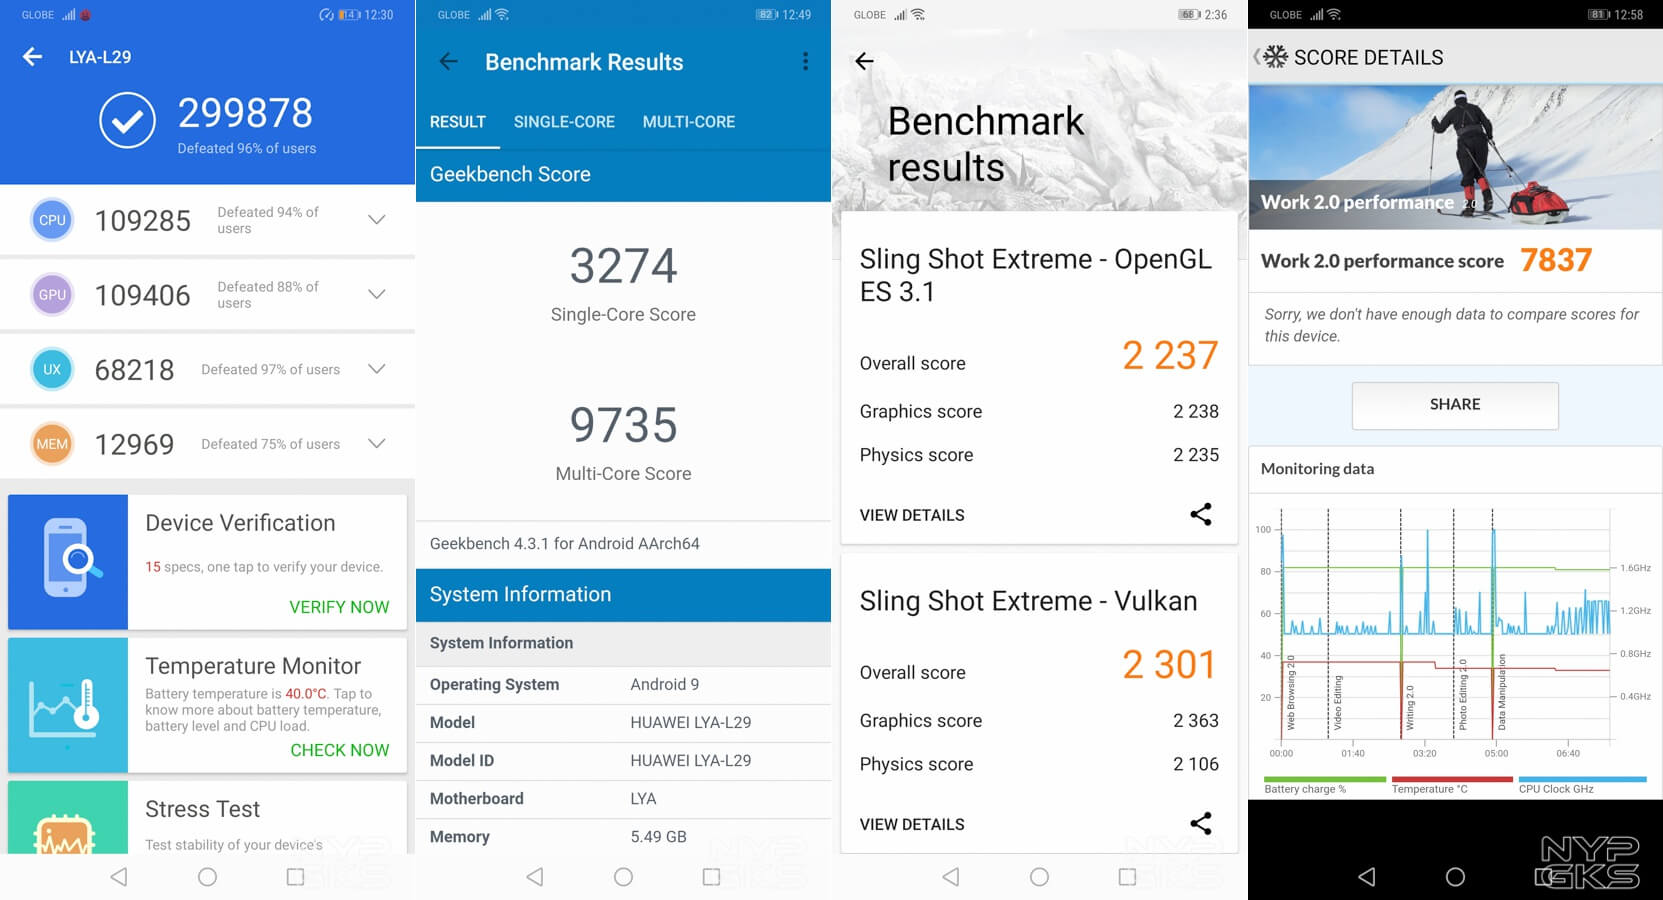 Huawei-Mate-20-Pro-benchmarks